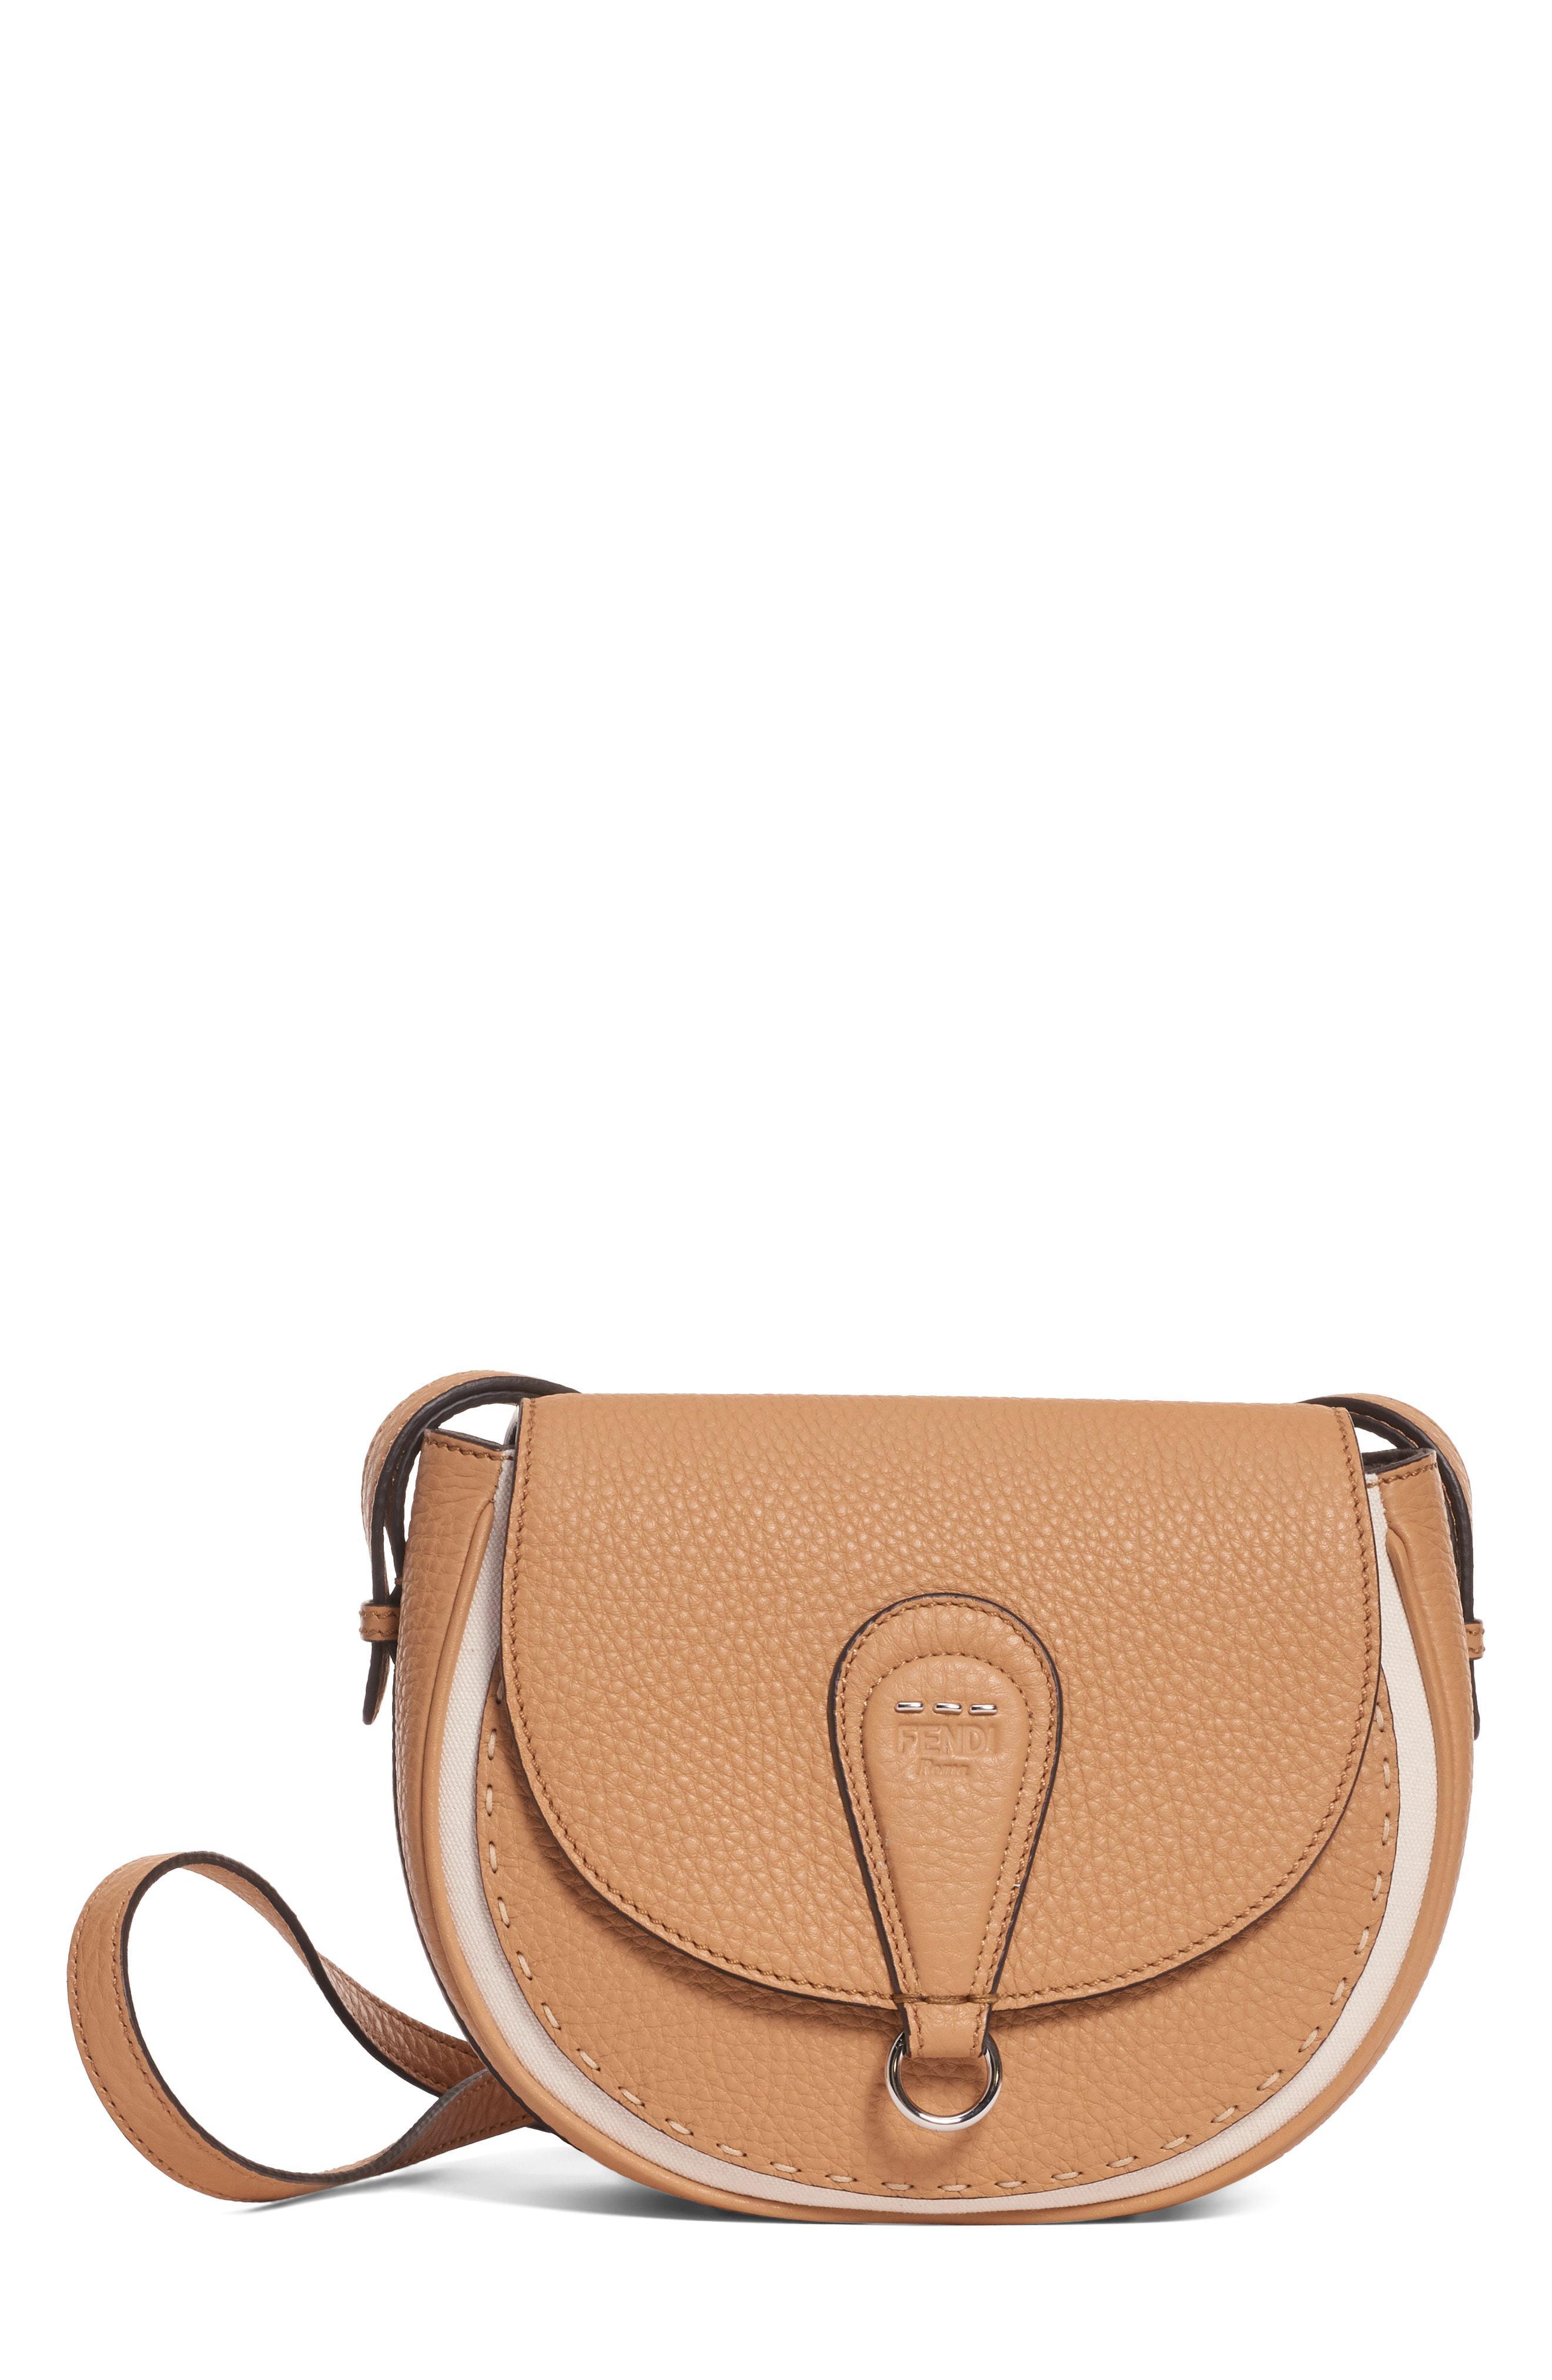 d1c0348aed1 Lyst - Fendi Messenger Selleria Leather Shoulder Bag - in Brown